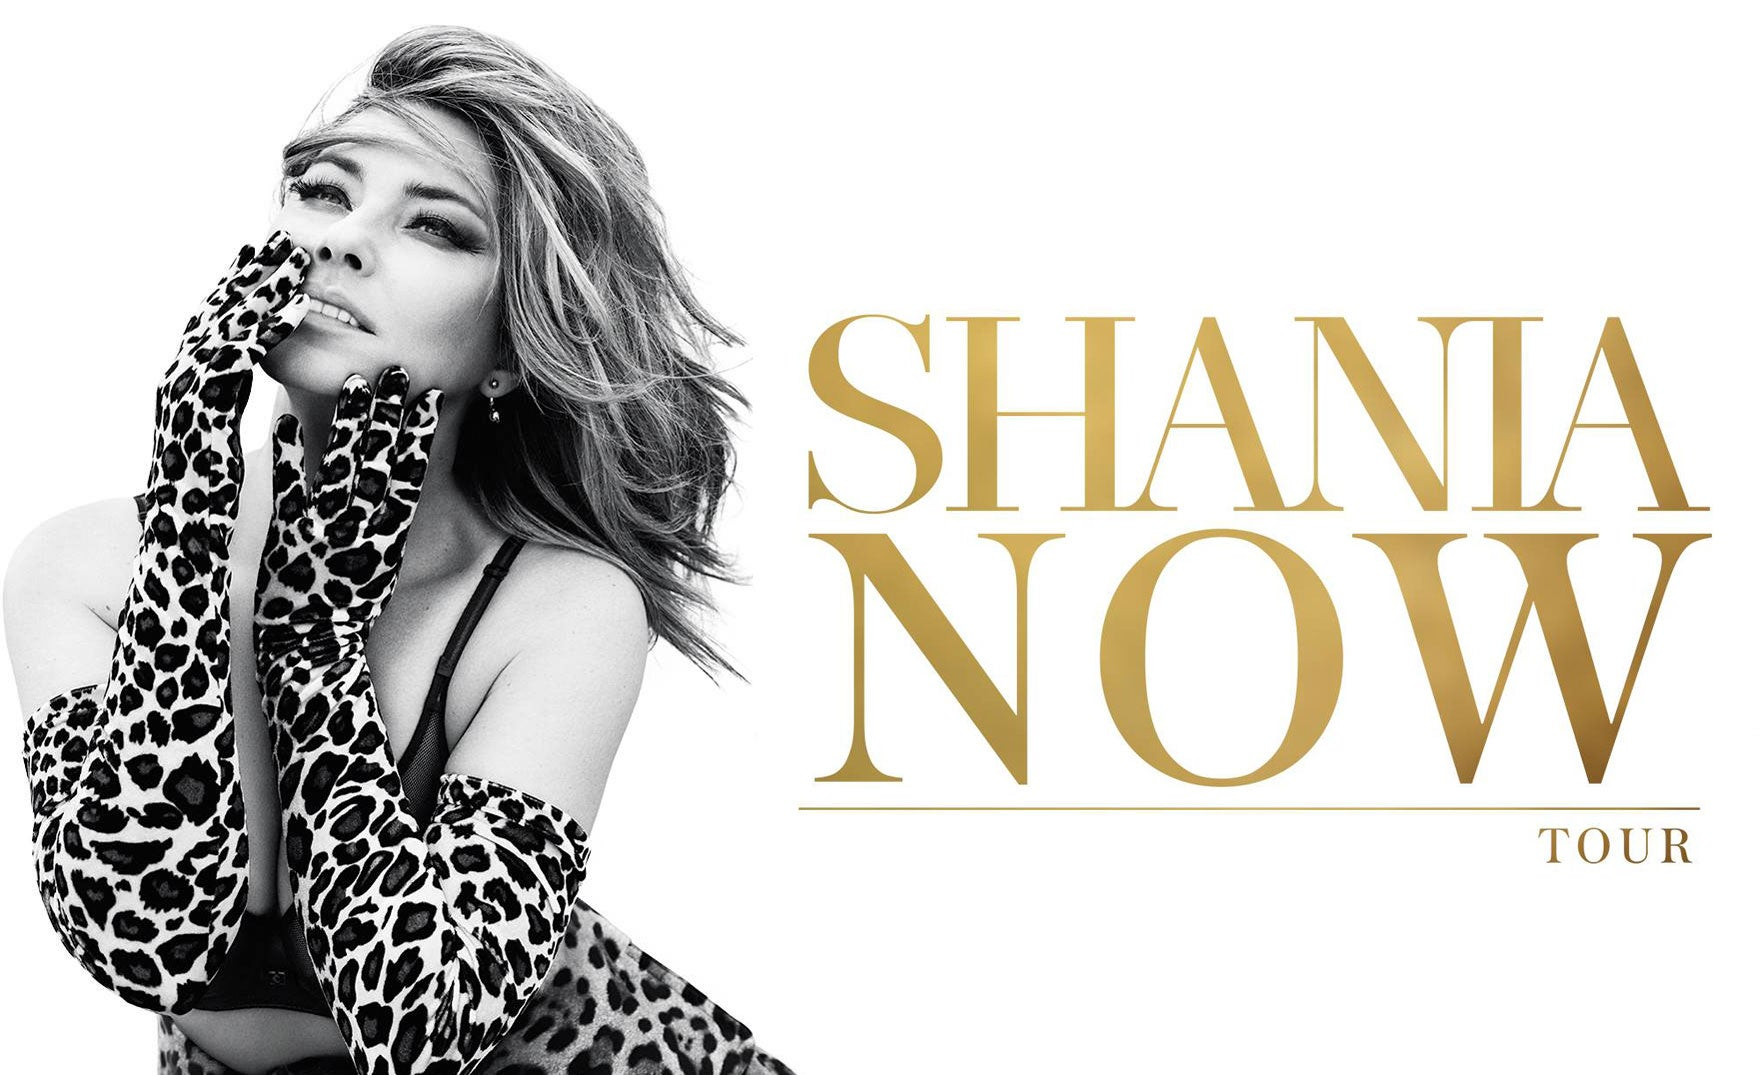 Shania twain tour dates in Brisbane